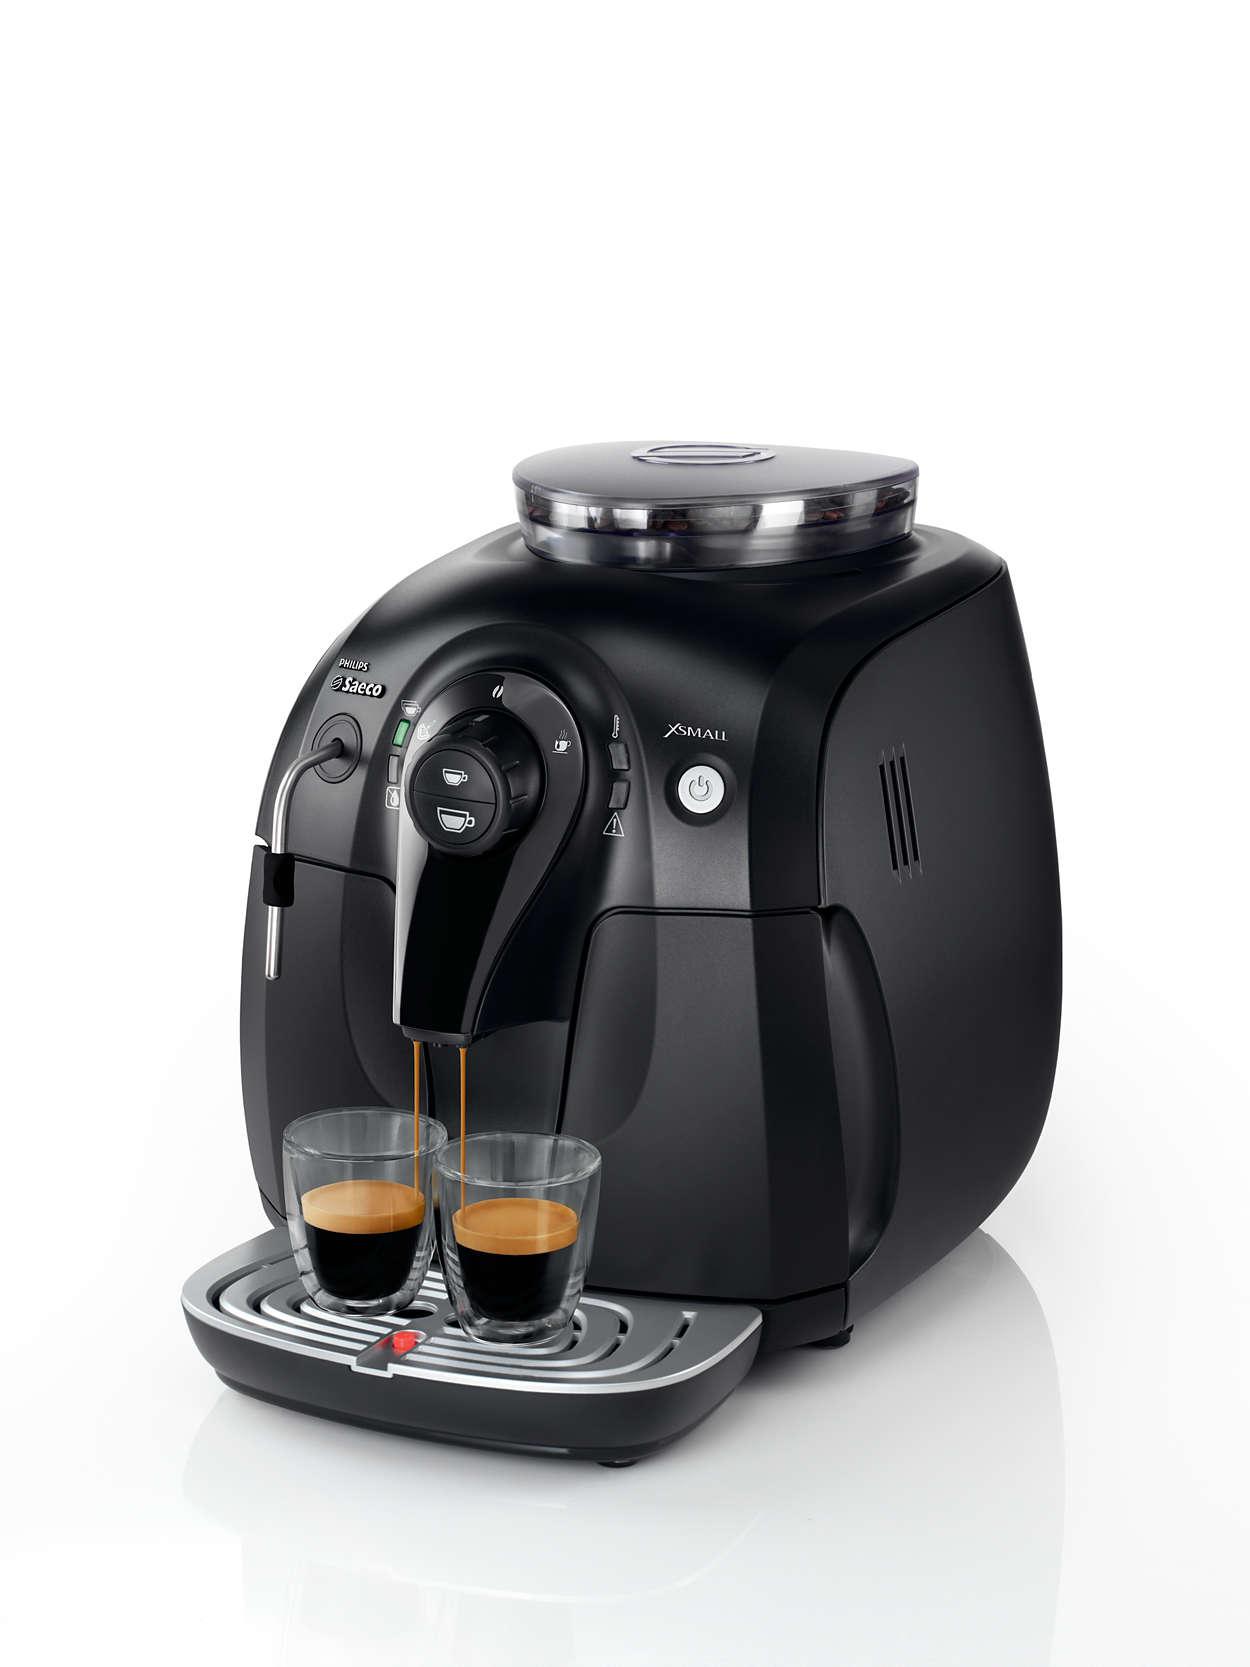 xsmall machine espresso super automatique hd8743 11 saeco. Black Bedroom Furniture Sets. Home Design Ideas